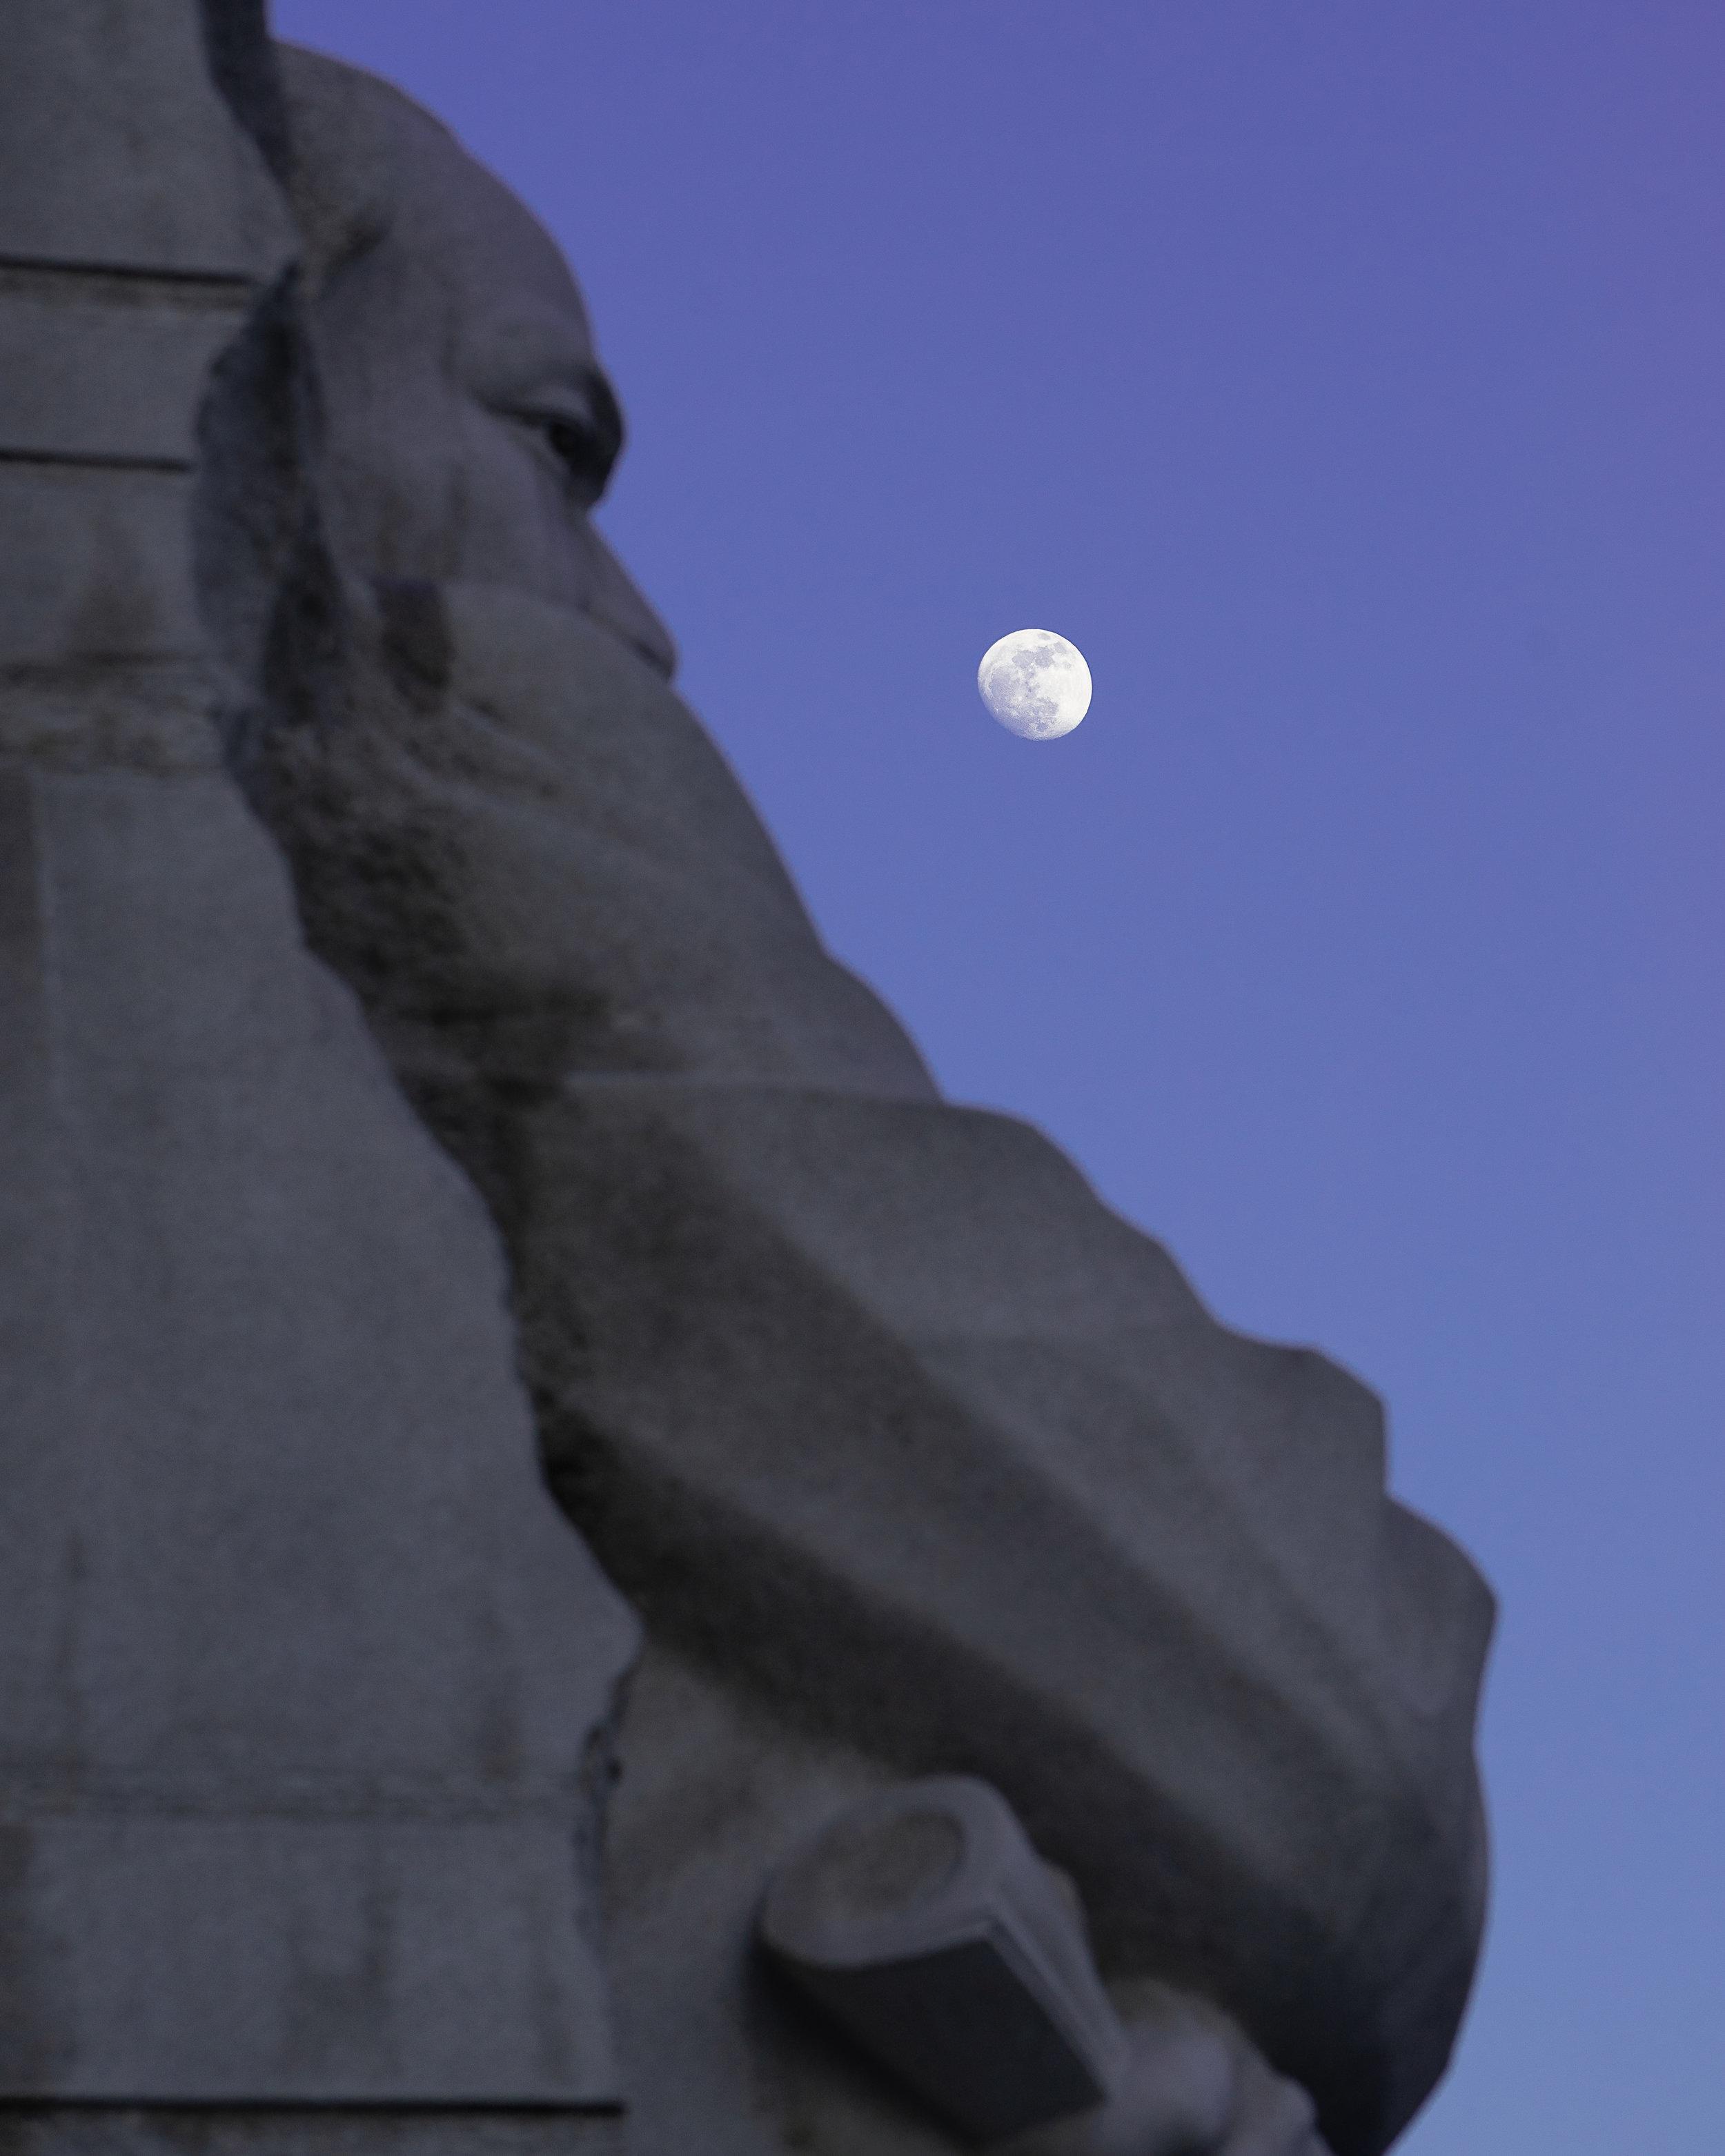 MLK Moon.jpg